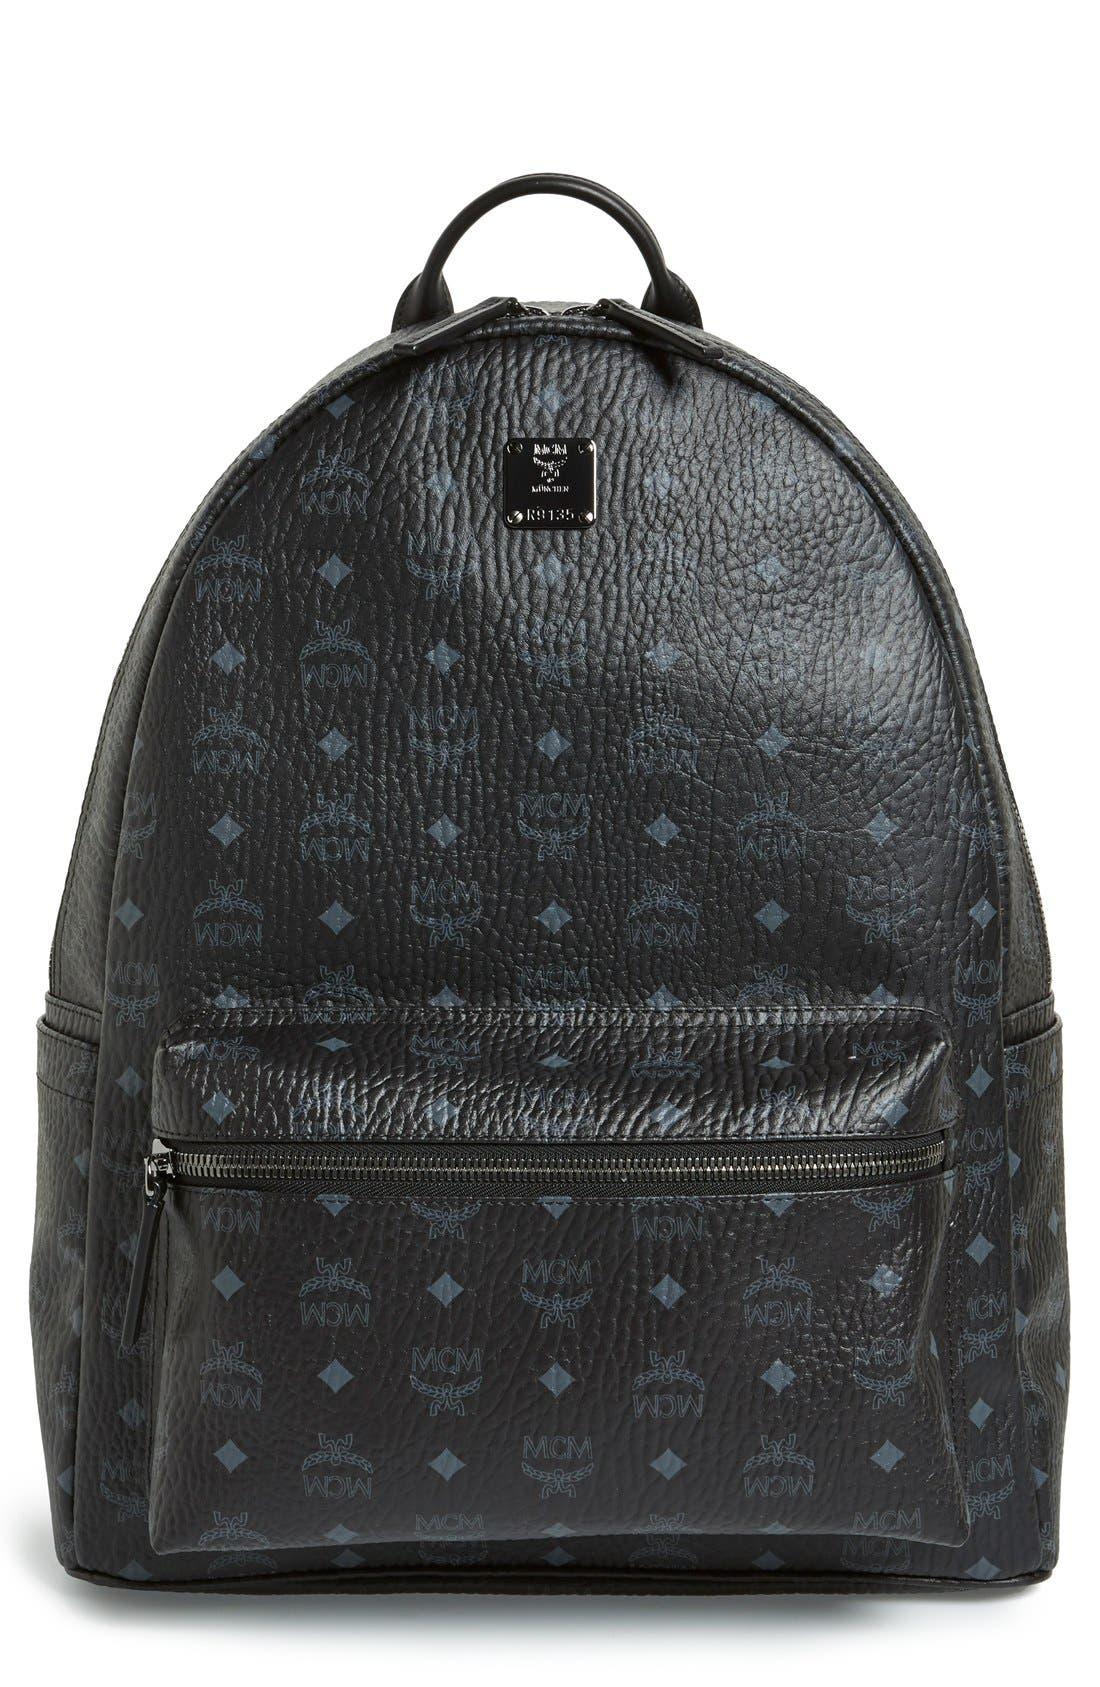 Main Image - MCM 'Large Stark' Backpack